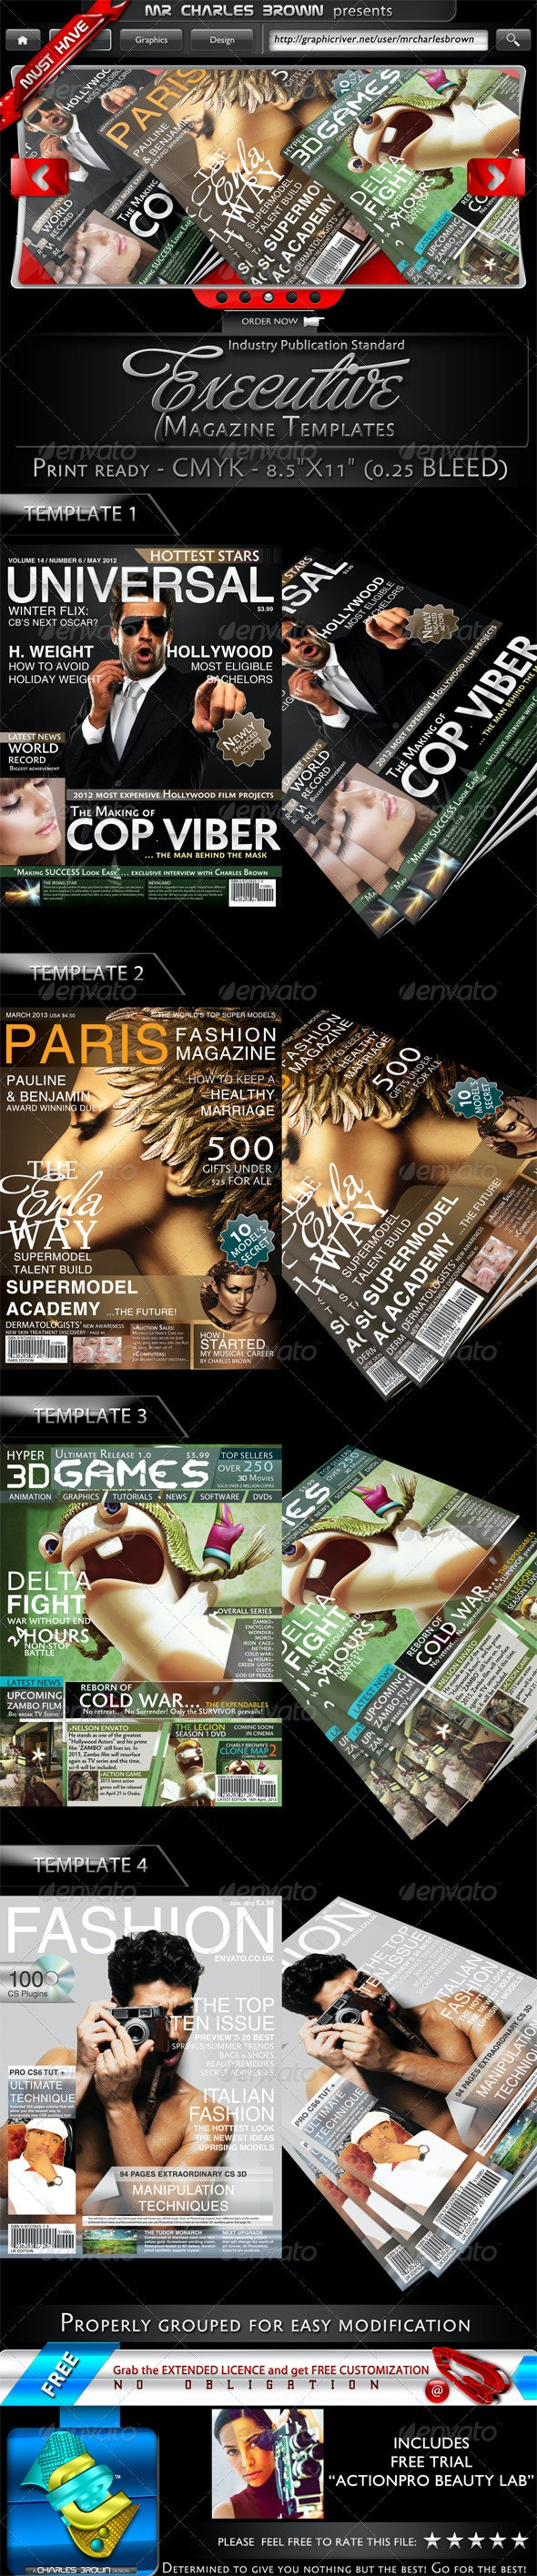 4 Executive Magazine Templates - Magazines Print Templates